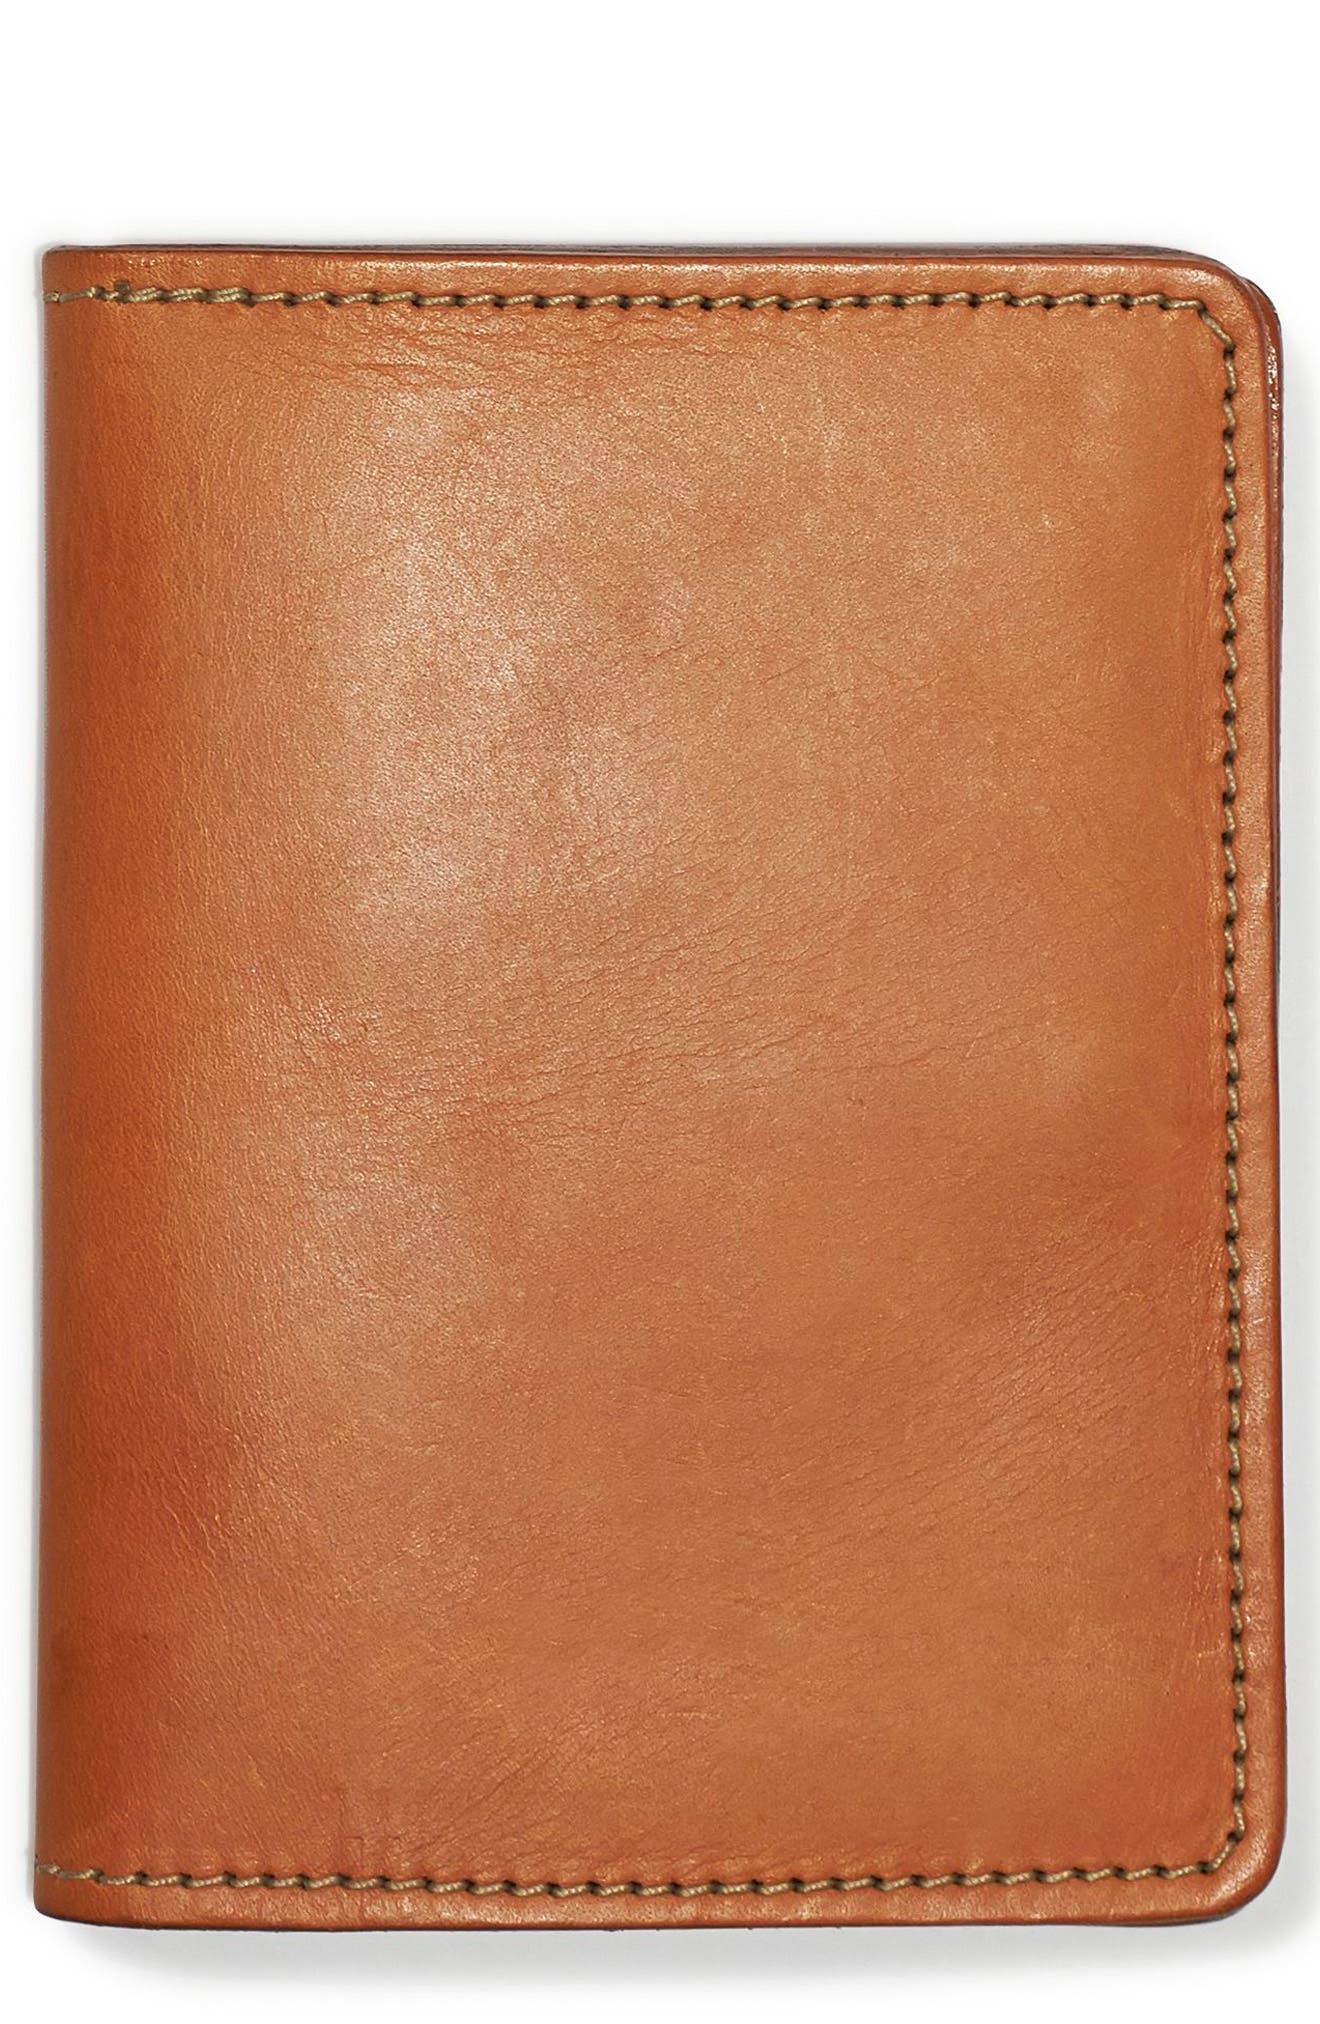 Main Image - Filson Leather Passport Case